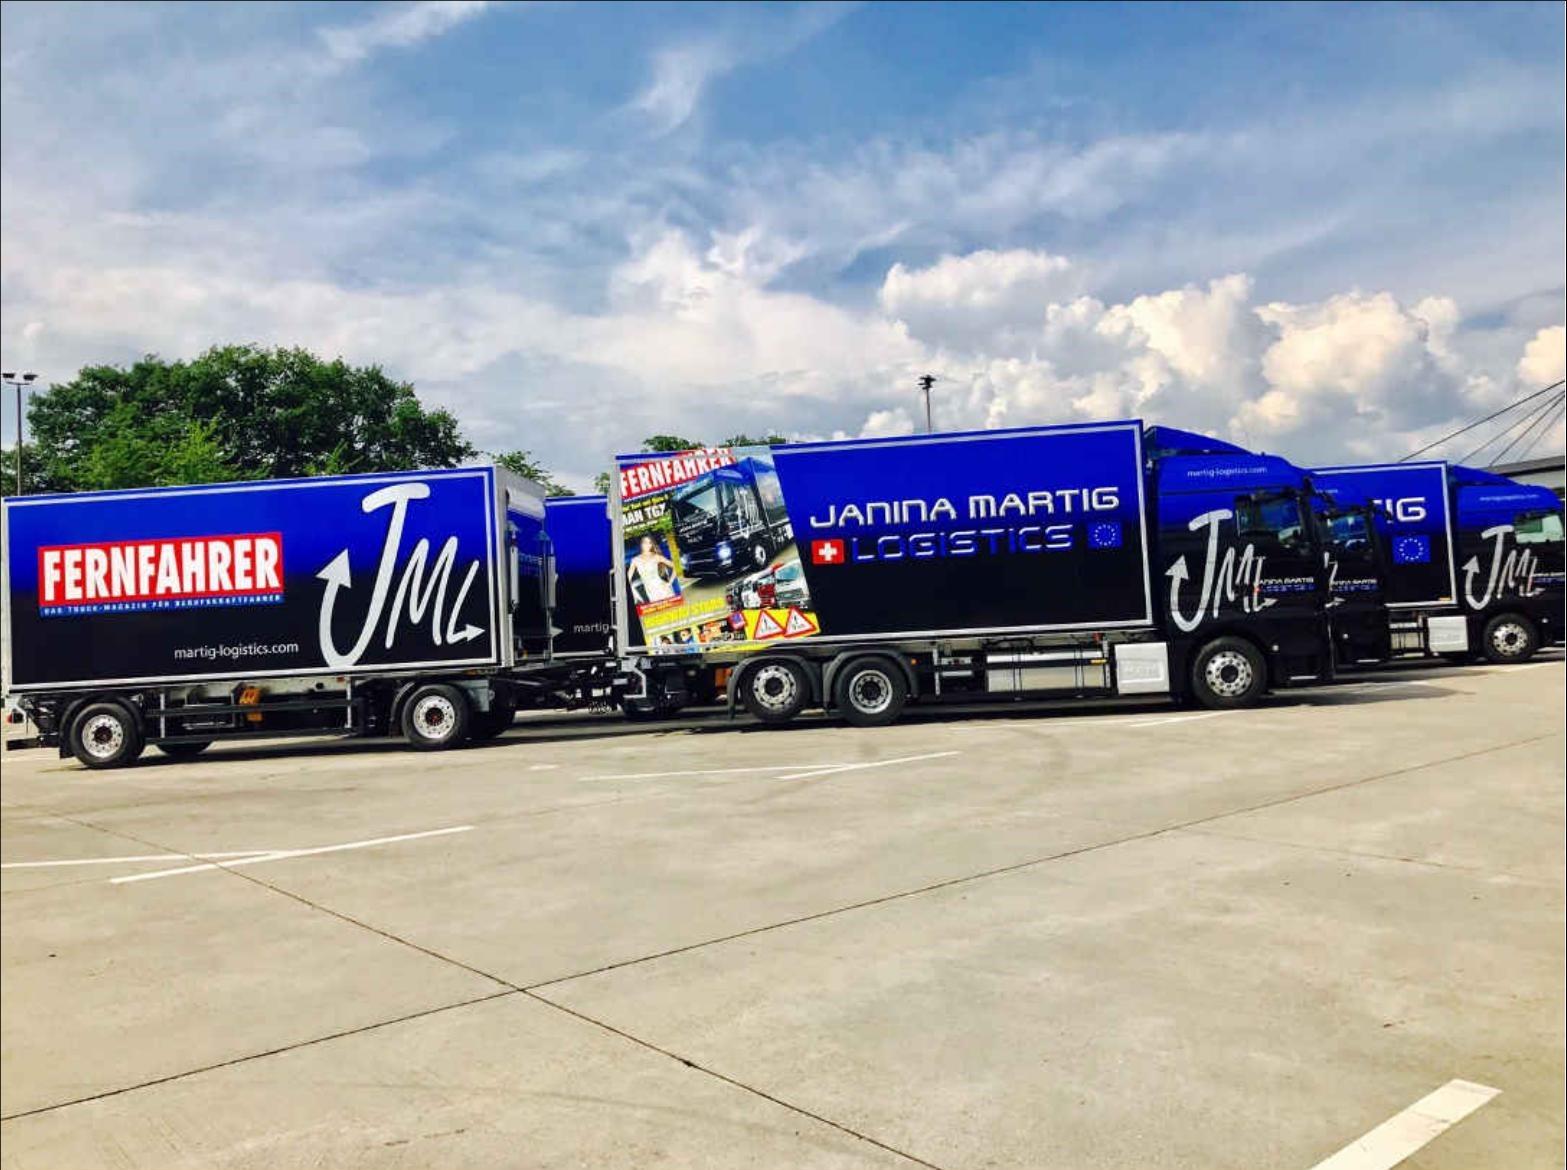 JML-Truck mit FERNFAHRER-Branding/Janina Martig Logistics